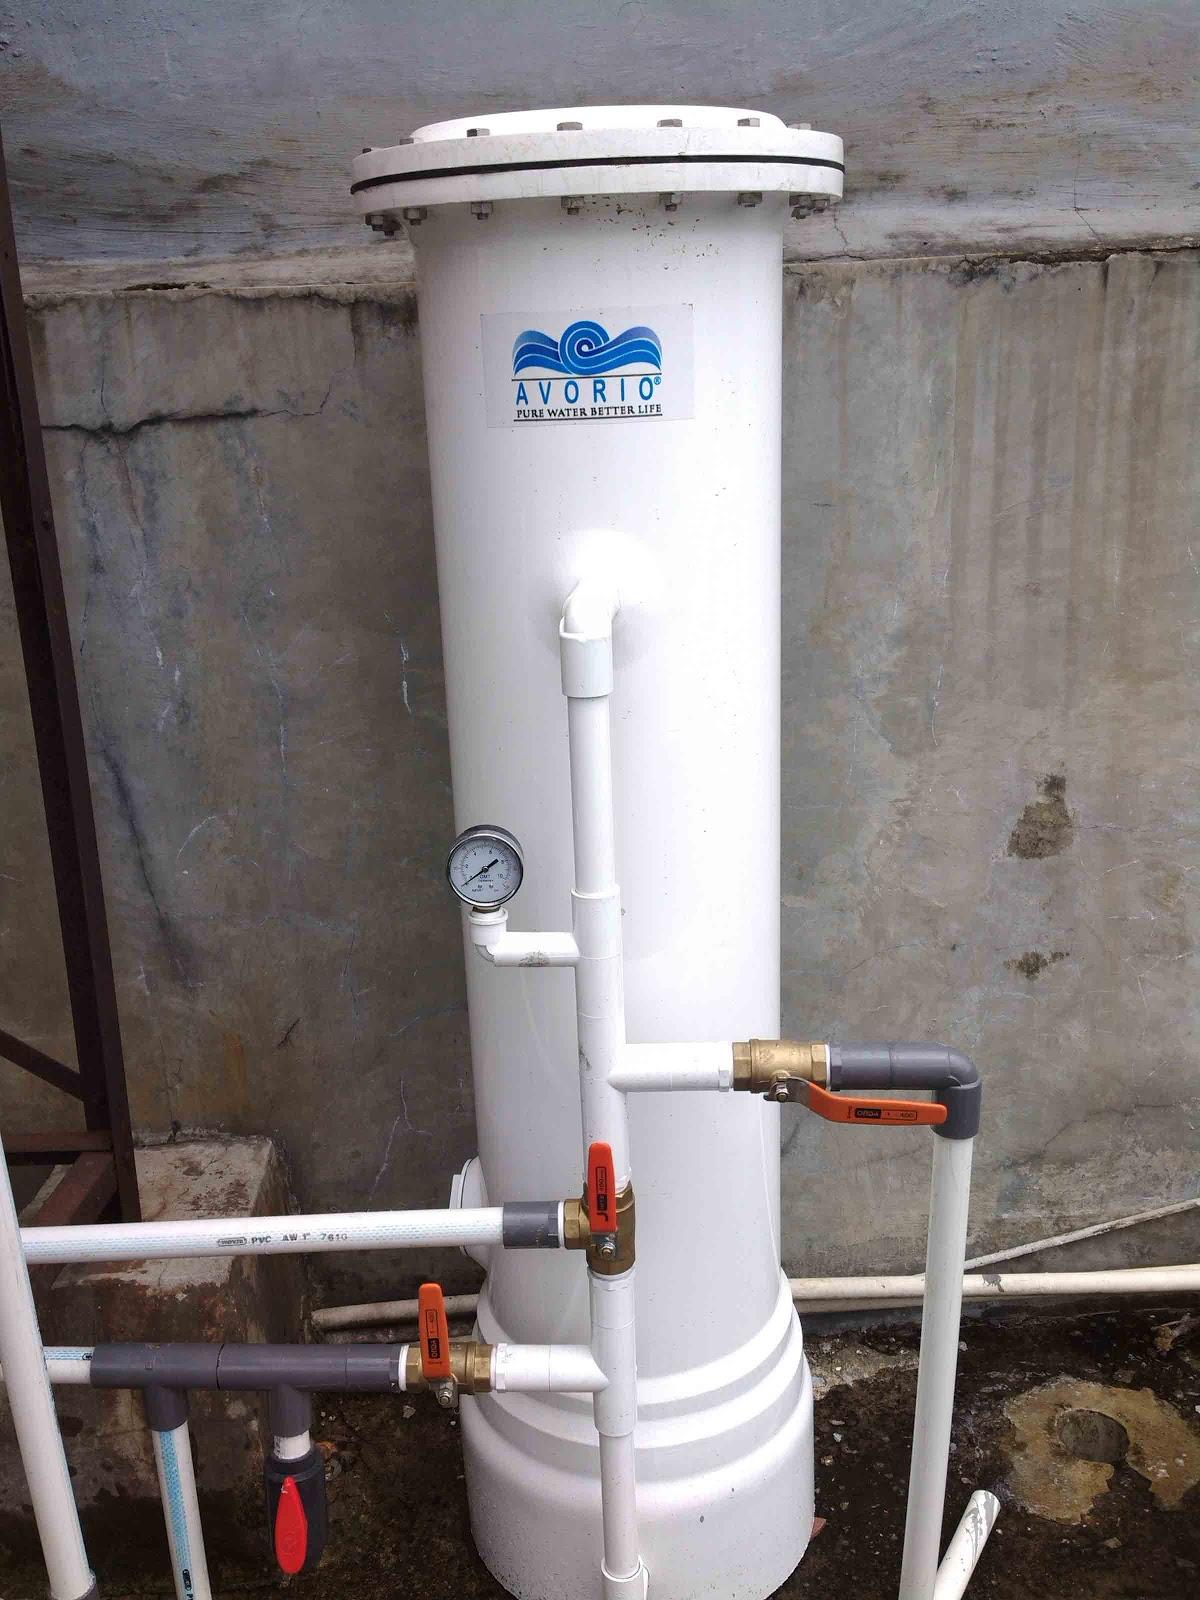 jual filter air harga murah. jakarta, bandung, depok, bogor, bekasi, tangerang